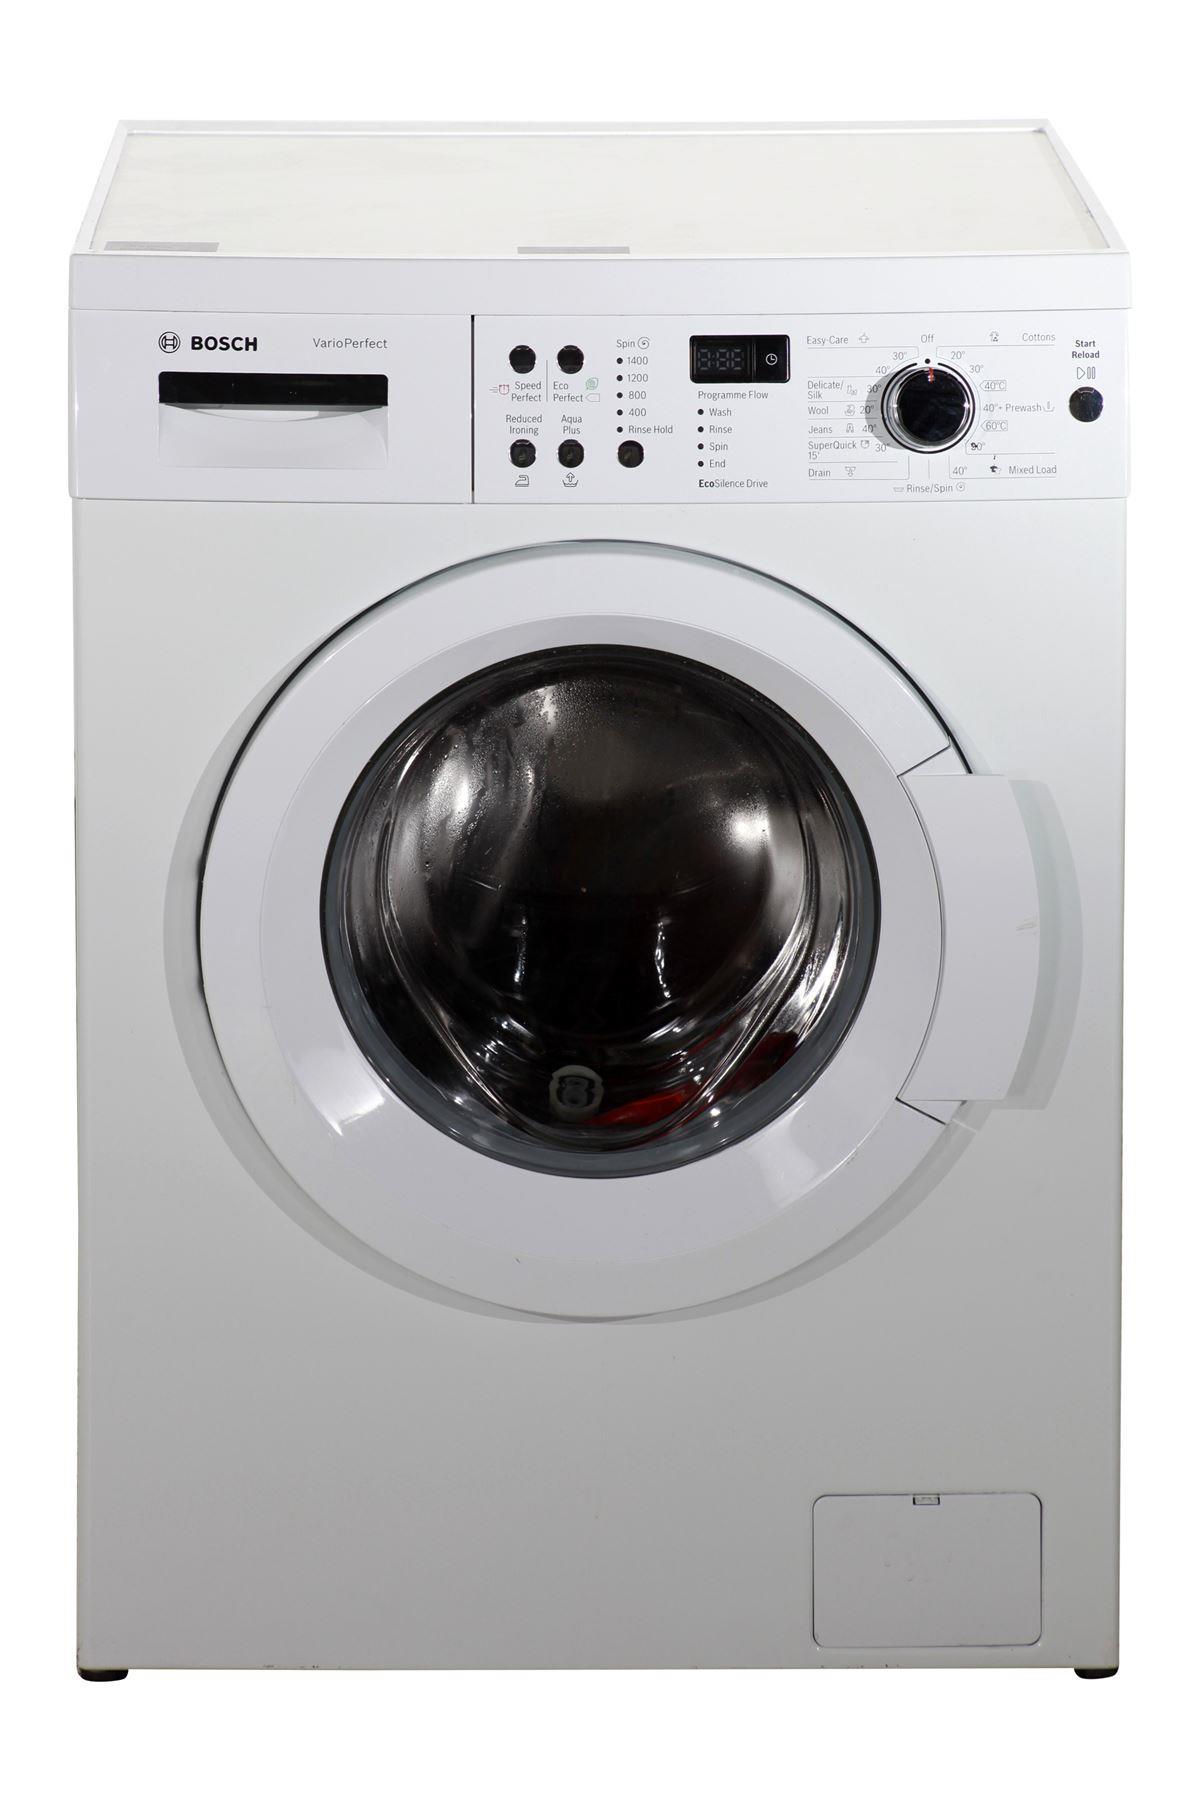 bosch 8kg vario perfect washing machine waq283s1gb. Black Bedroom Furniture Sets. Home Design Ideas